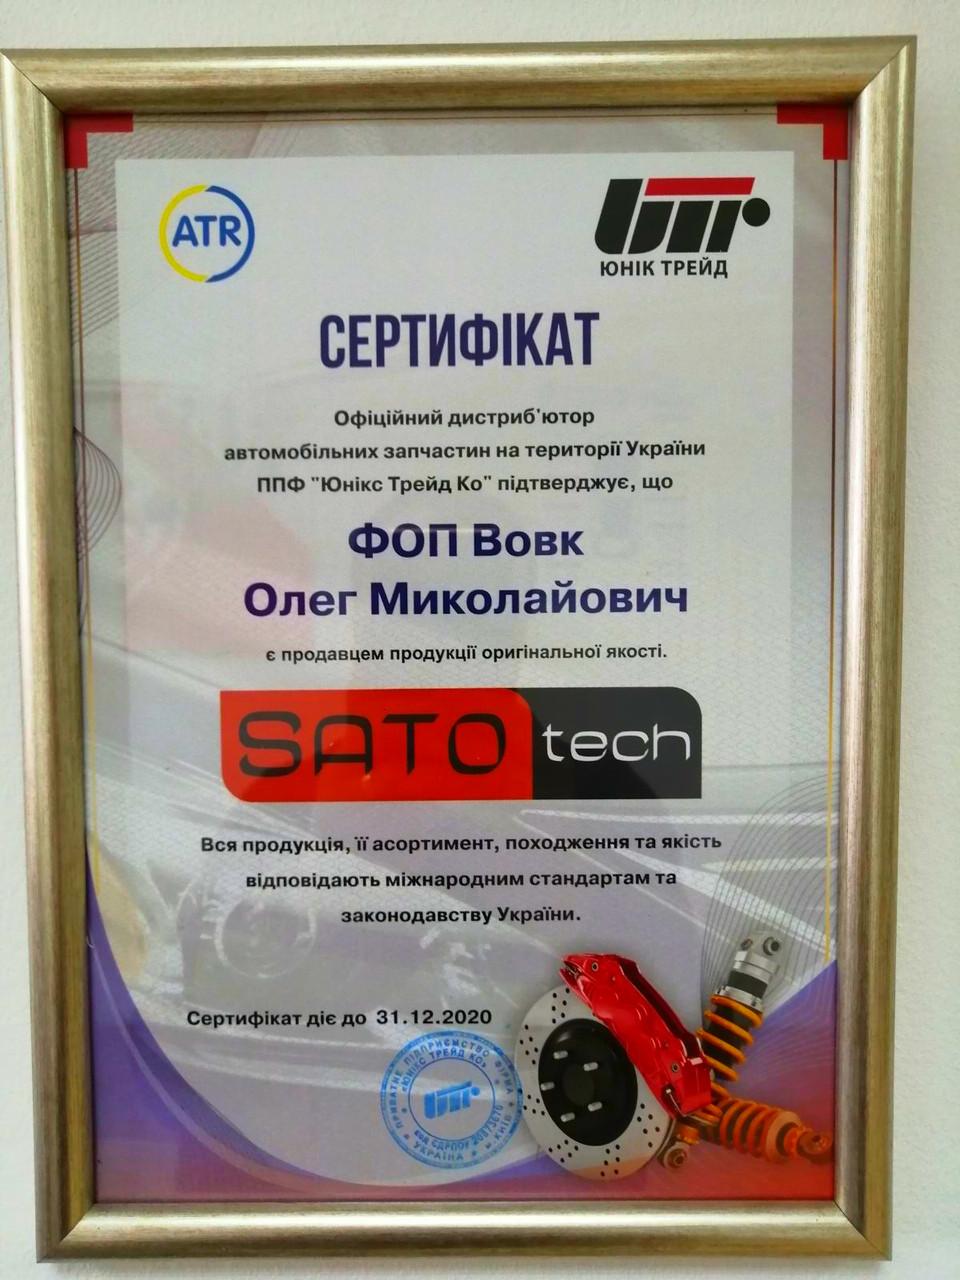 SATO Амортизатор BMW 5 Series GT (F07) 10-